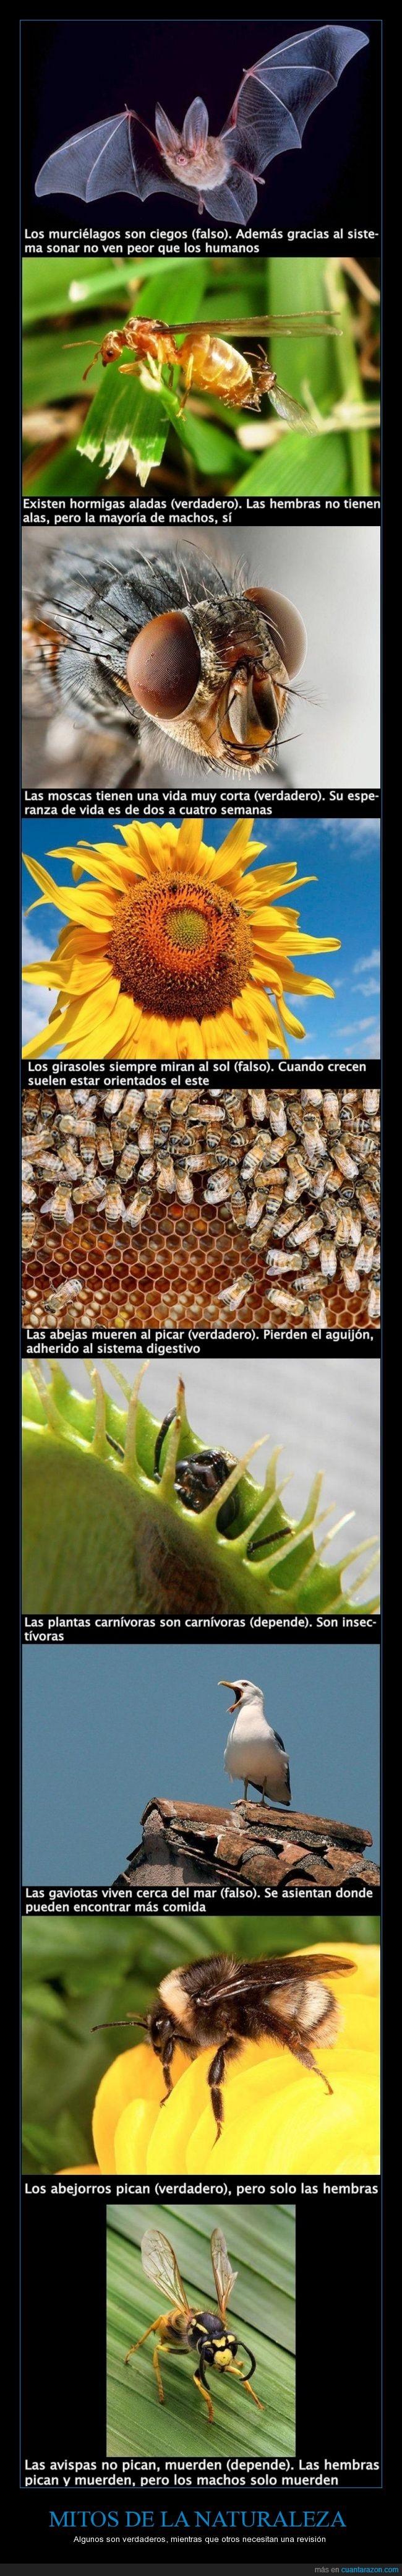 abejas,abejorros,avispas,ciegos,curioso,gaviotas,girasoles,hormigas aladas,Mitos de la naturaleza,moscas,Murciélagos,plantas carnívoras,realidad científica